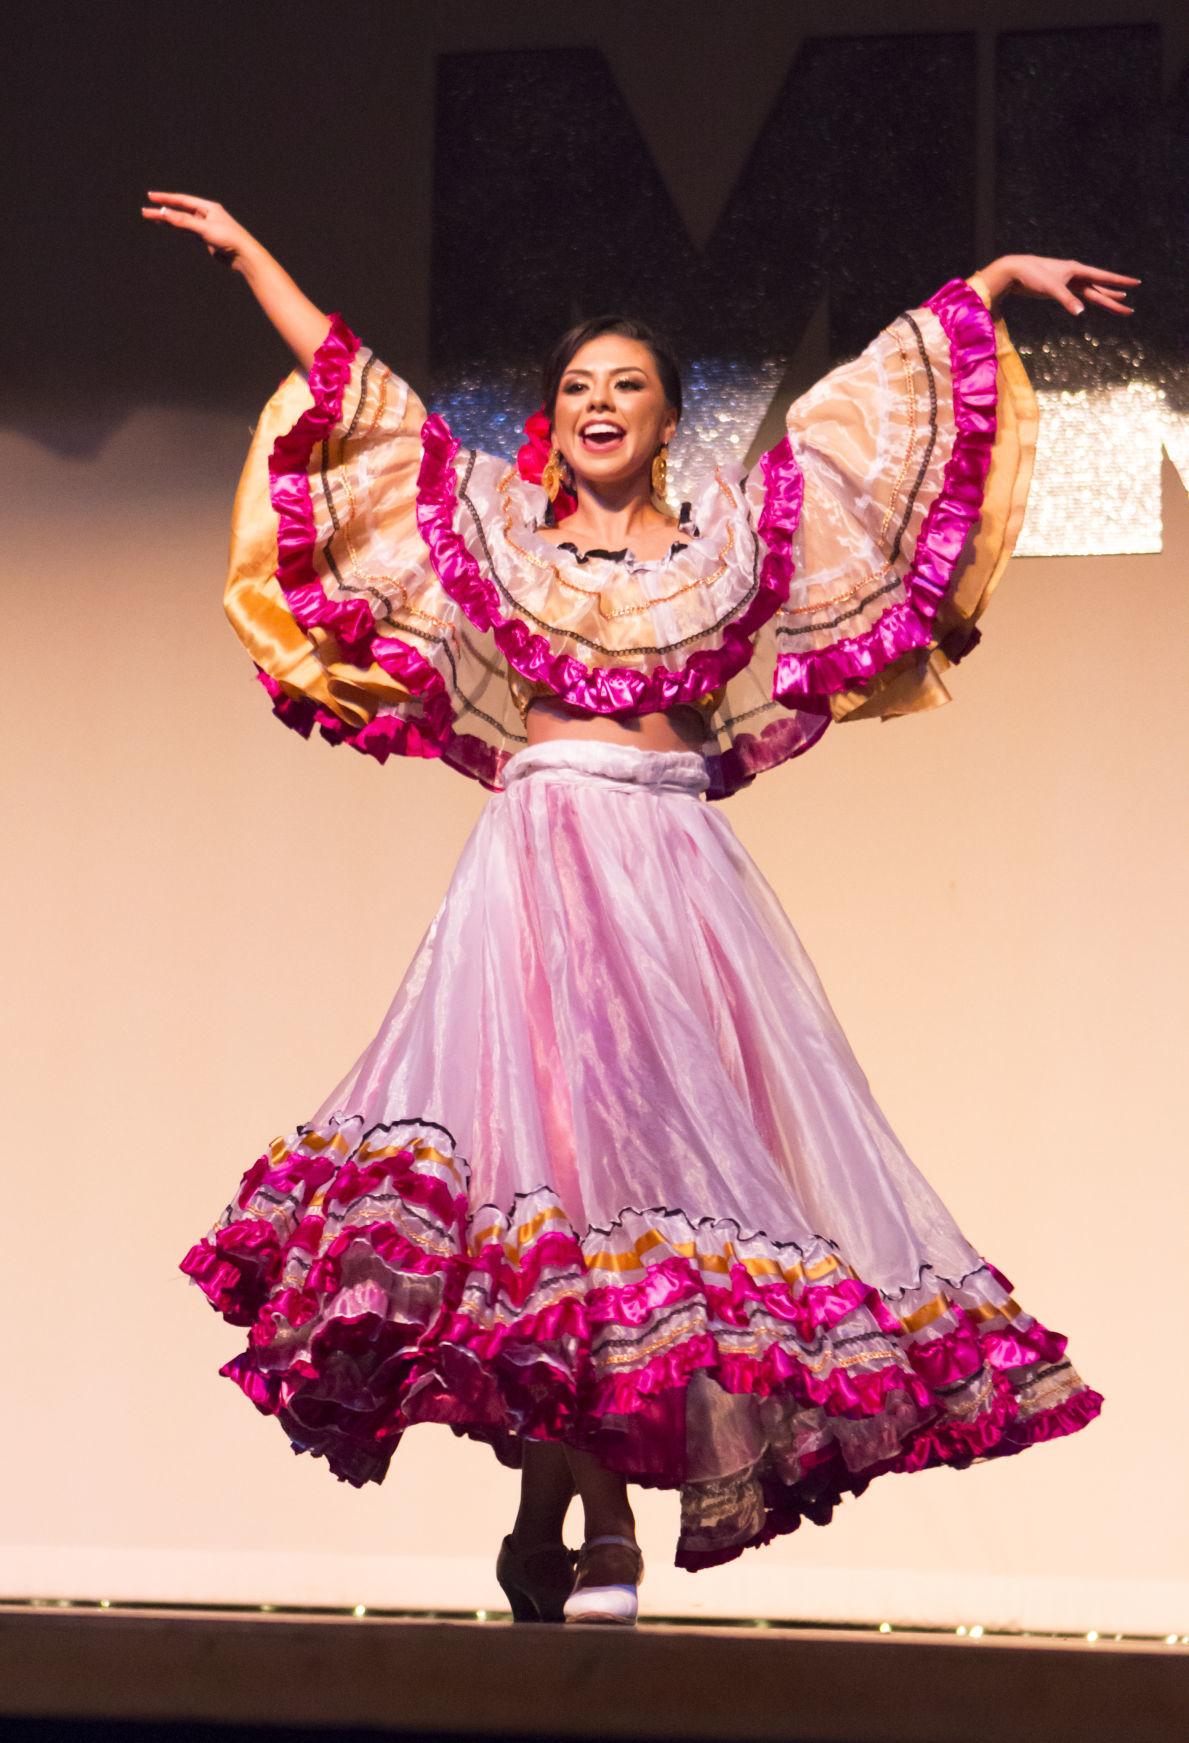 81a67da8a Medina looks back on year as Miss Kings County